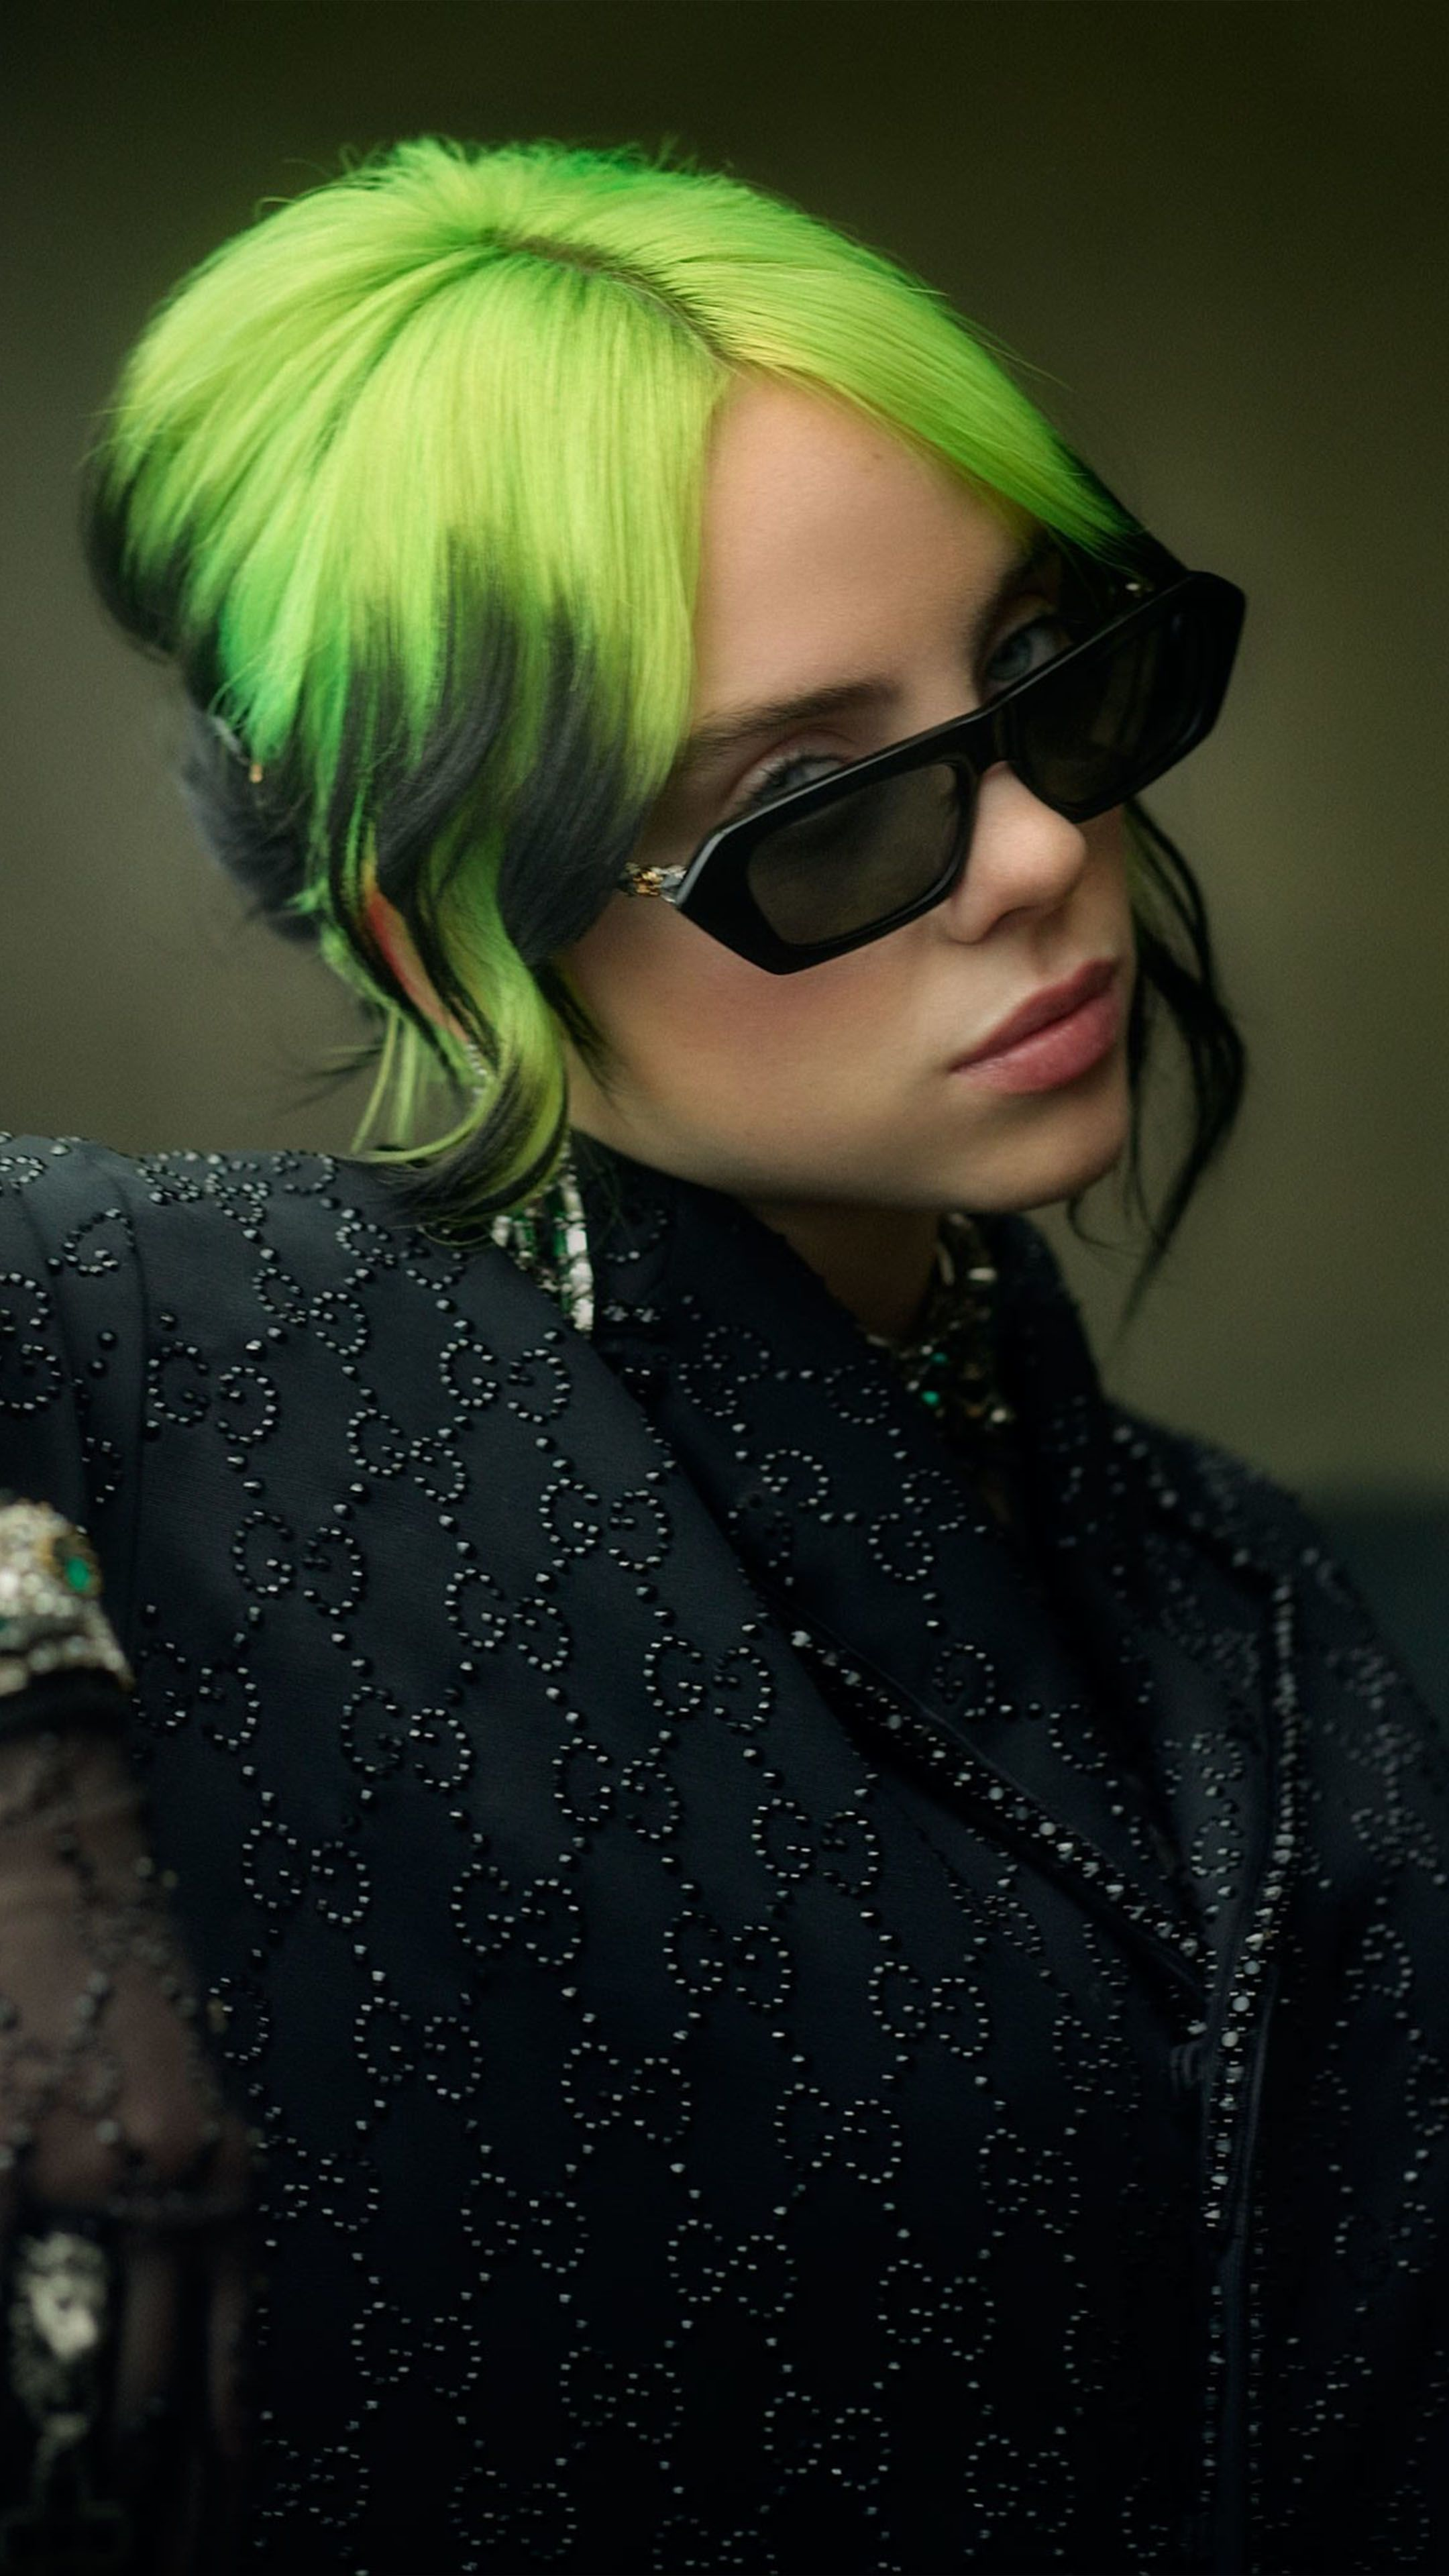 Billie Eilish Green Hair Wallpapers Top Free Billie Eilish Green Hair Backgrounds Wallpaperaccess